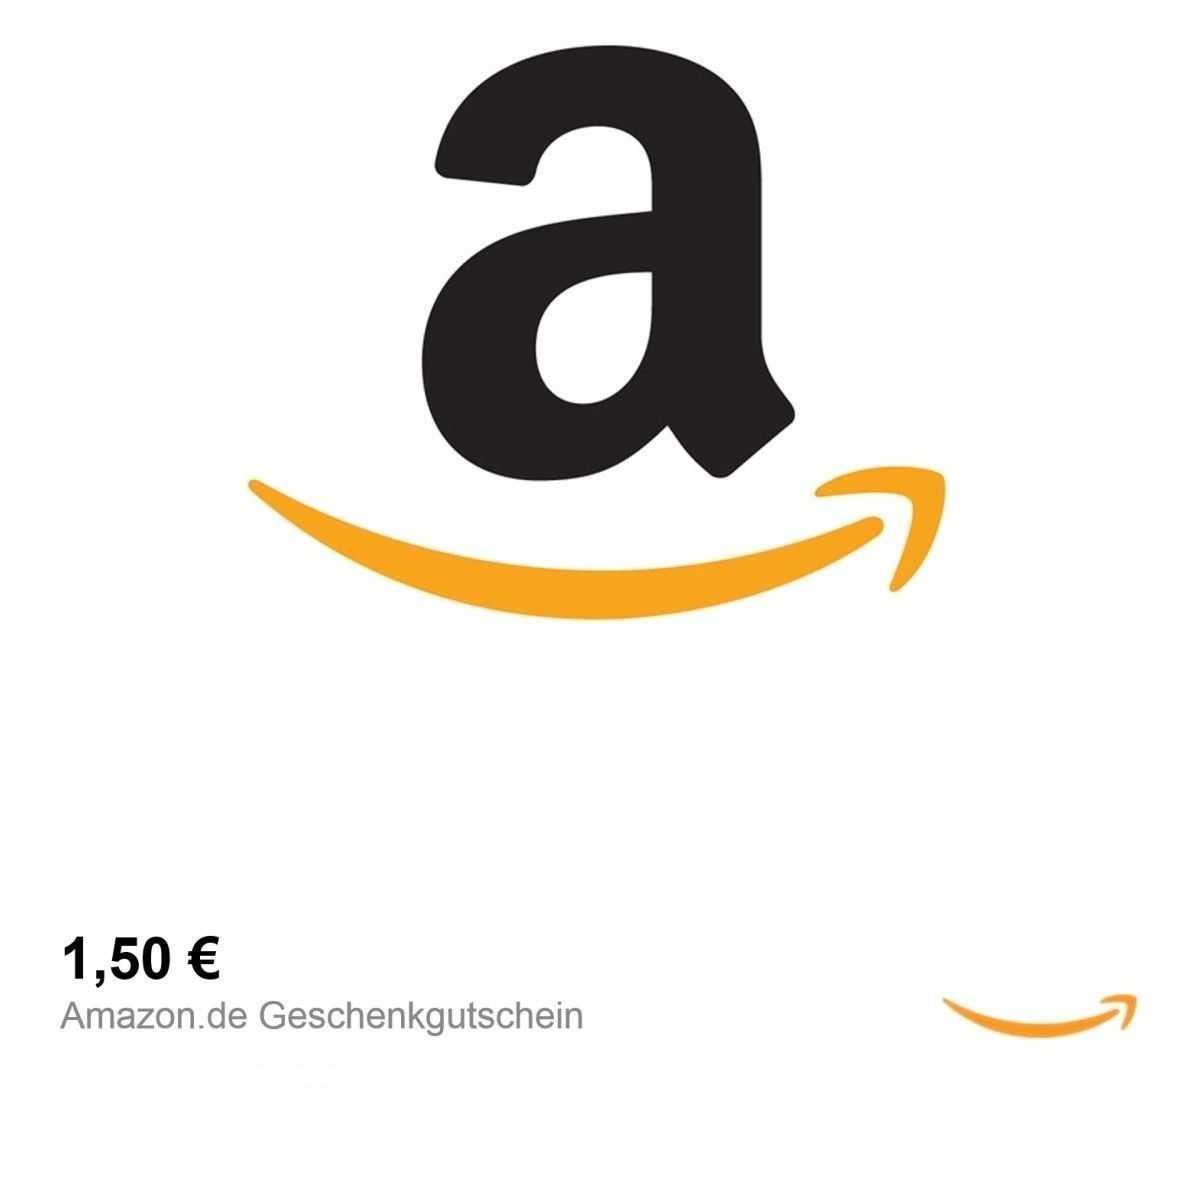 ebay 150e amazon gutschein fuer 1e